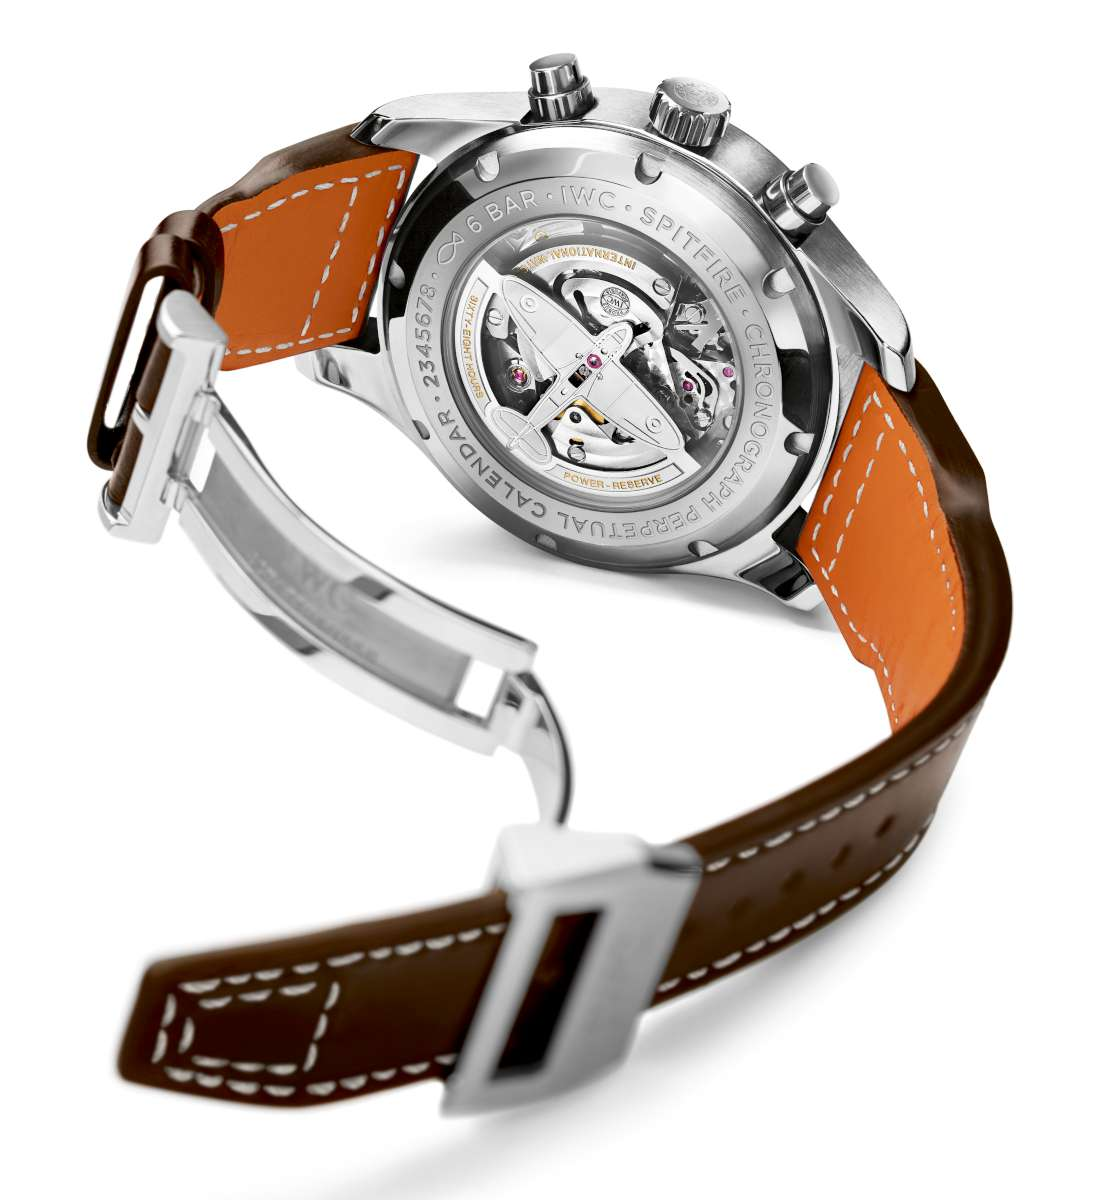 Iwc Pilot S Watch Perpetual Calendar Digital Date Month